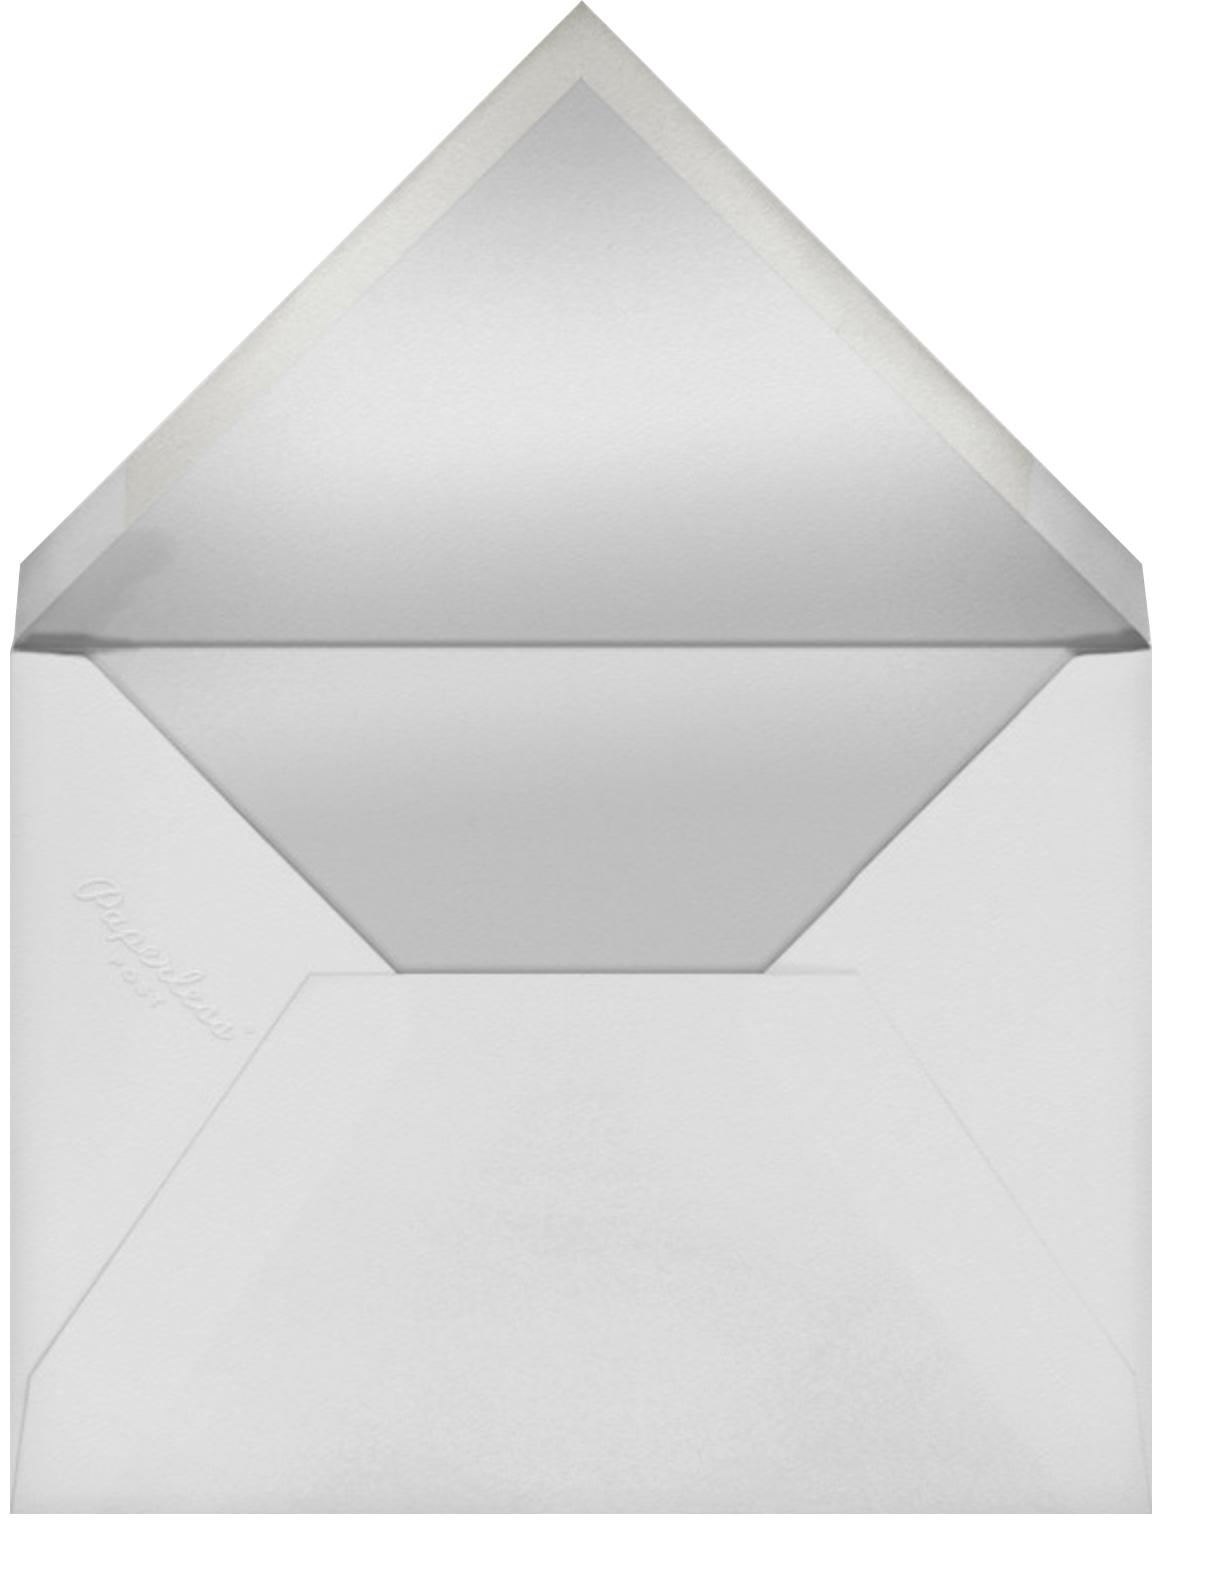 Marylebone Nursery - Celery - Paperless Post - Baby shower - envelope back